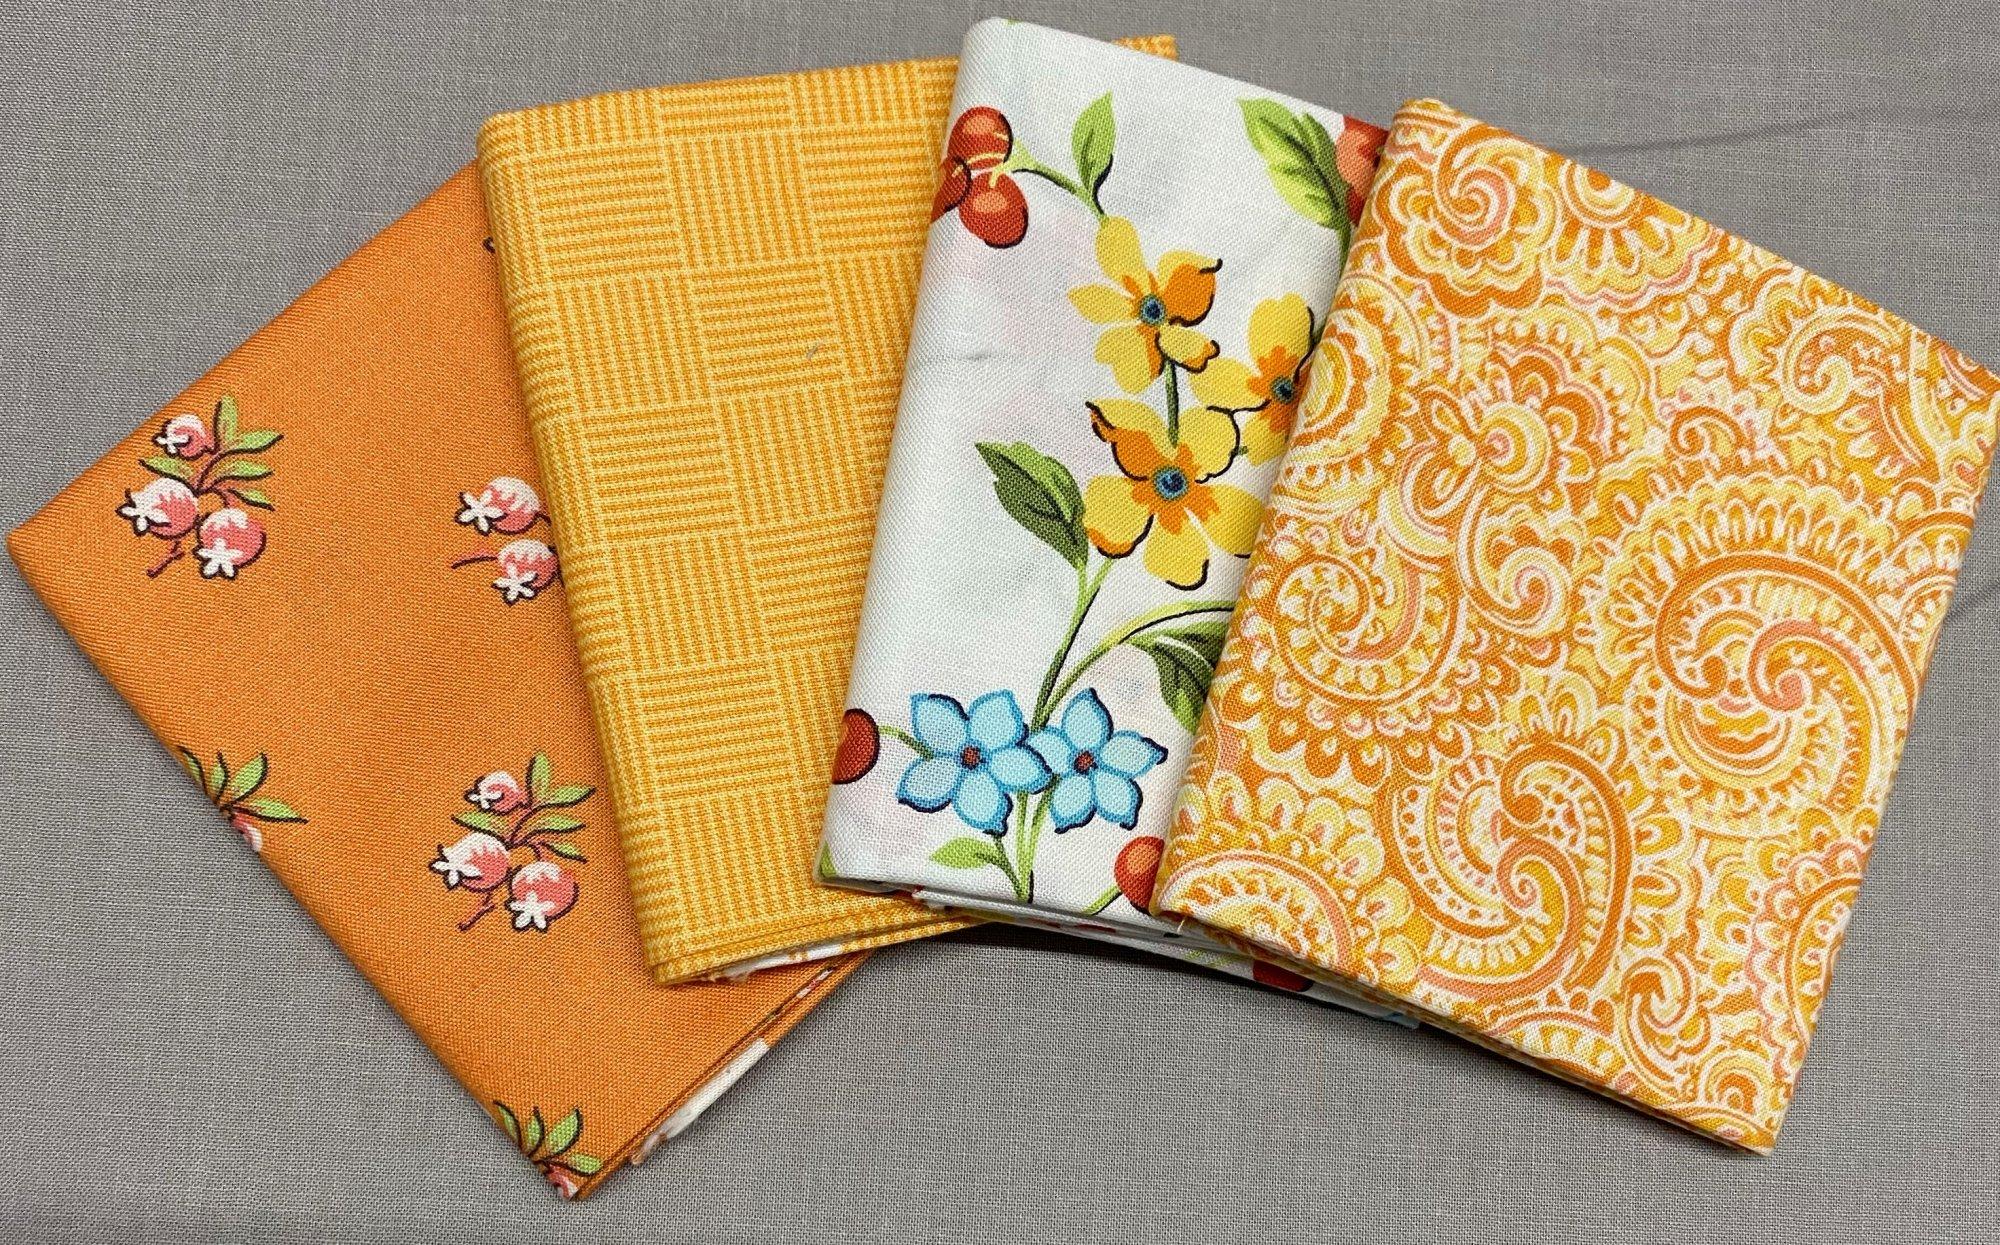 Roseberry Cottage Fat Quarter Bundle Andover Fabrics 108